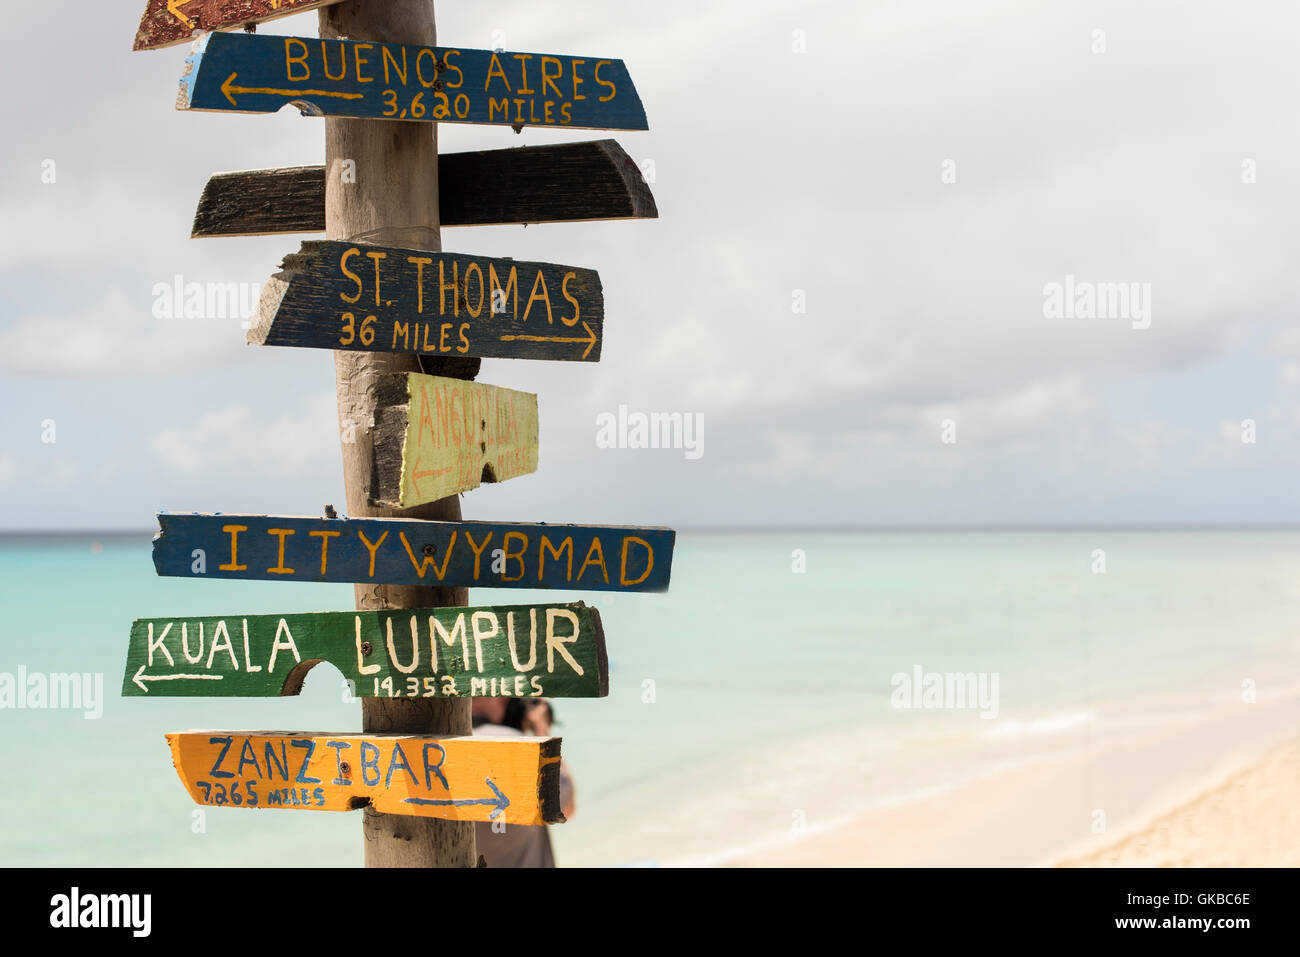 St Croix St Thomas USVI VI Zanzibar arrows distances signs - Stock Image